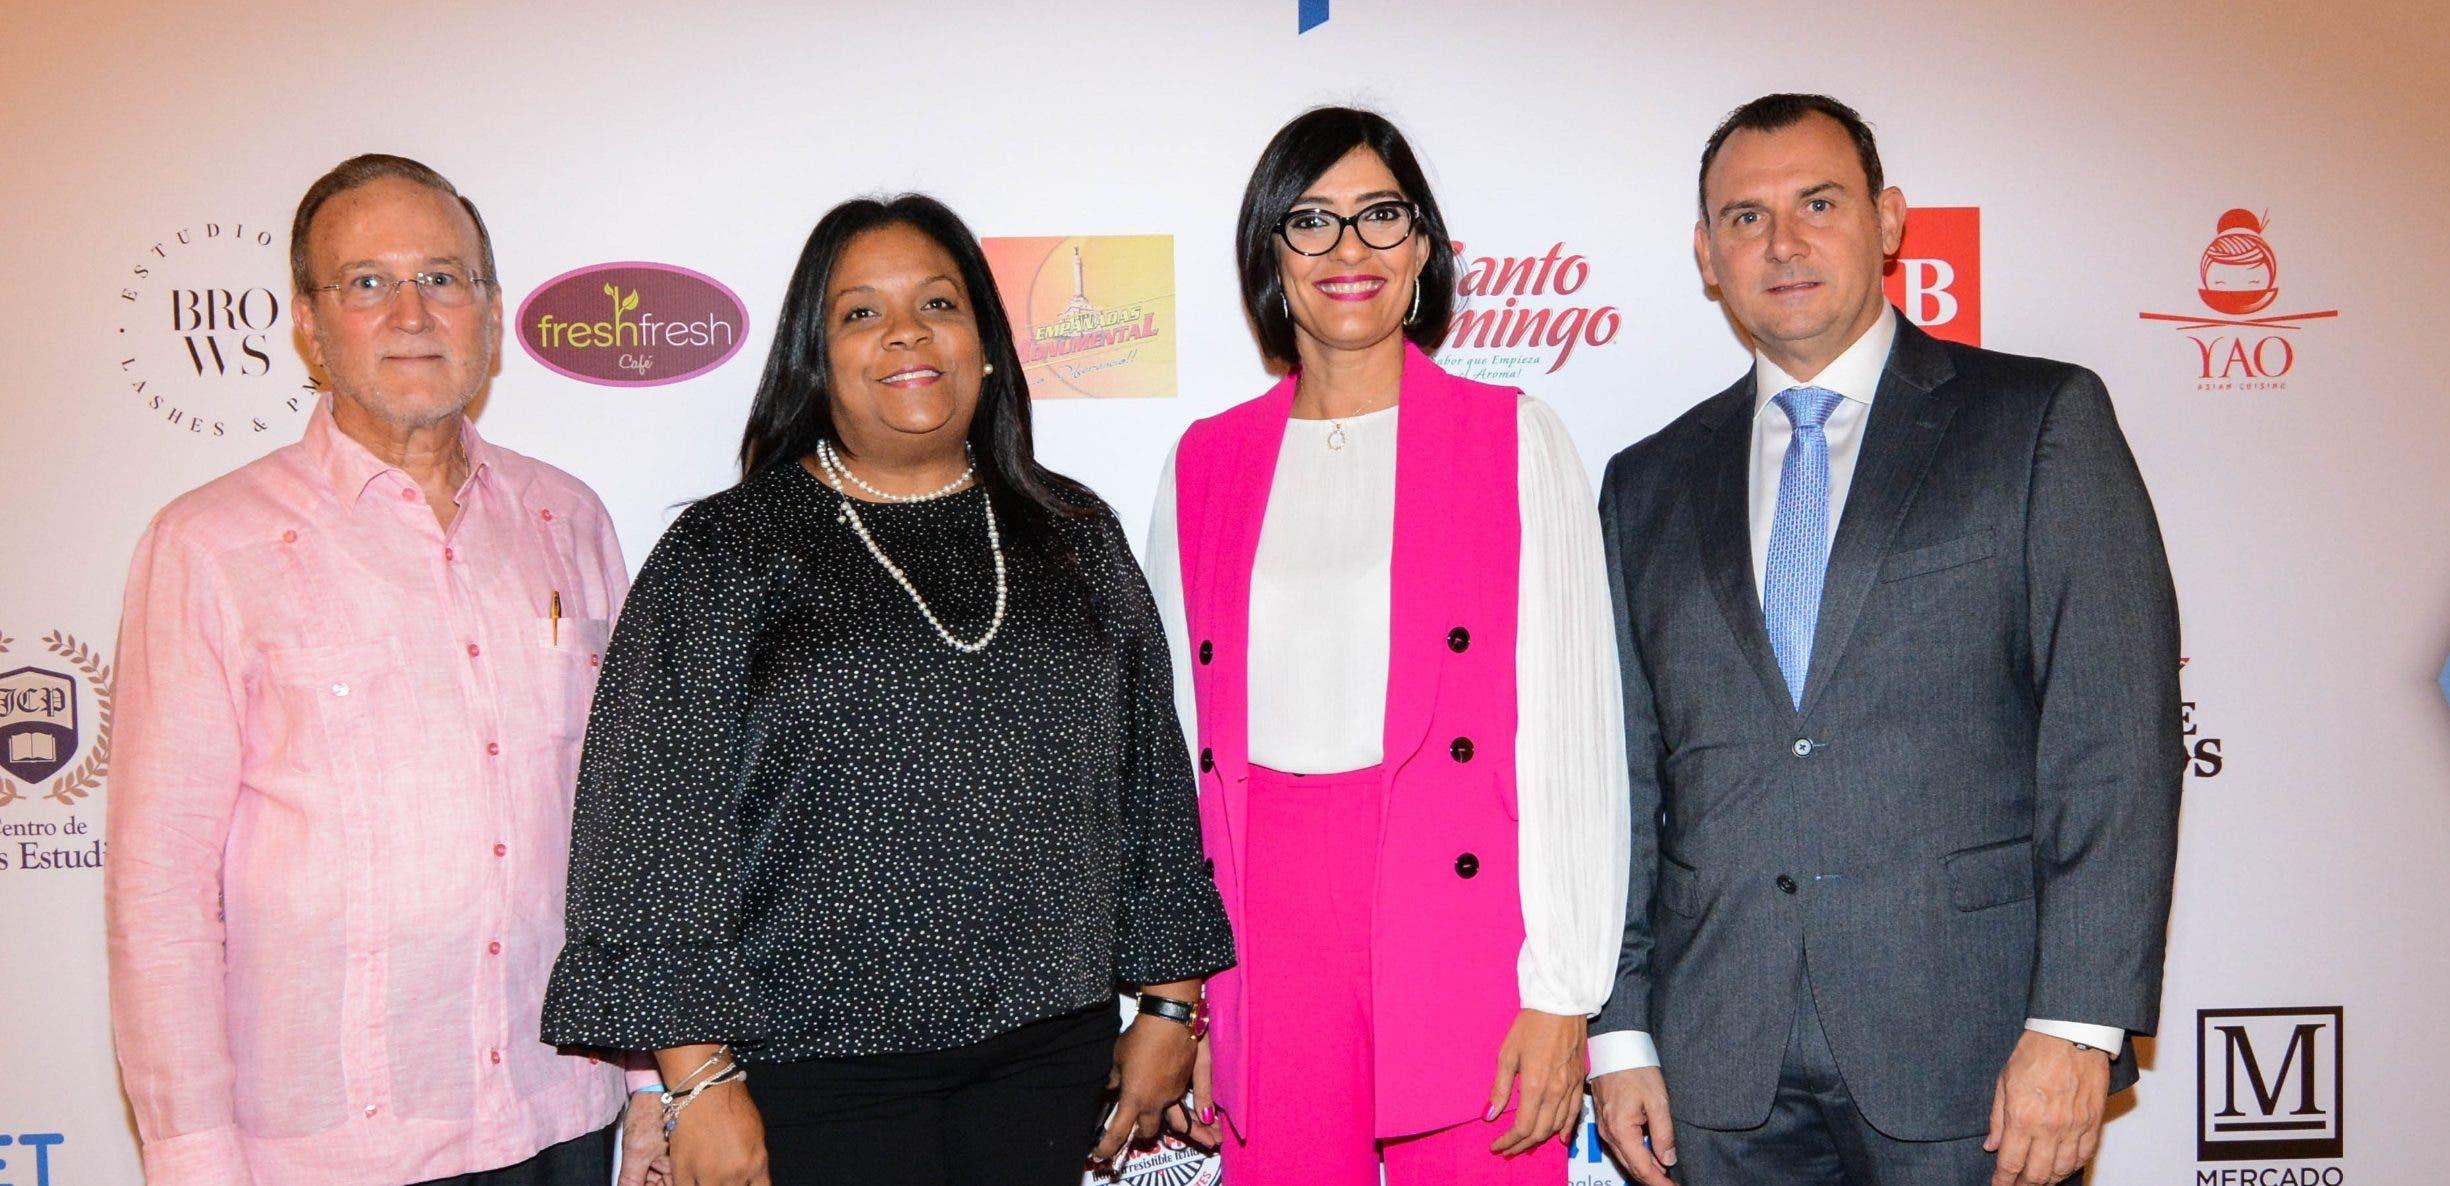 Ignacio Méndez, Larissa Amezquita, Jennifer Báez y Simón Planas.